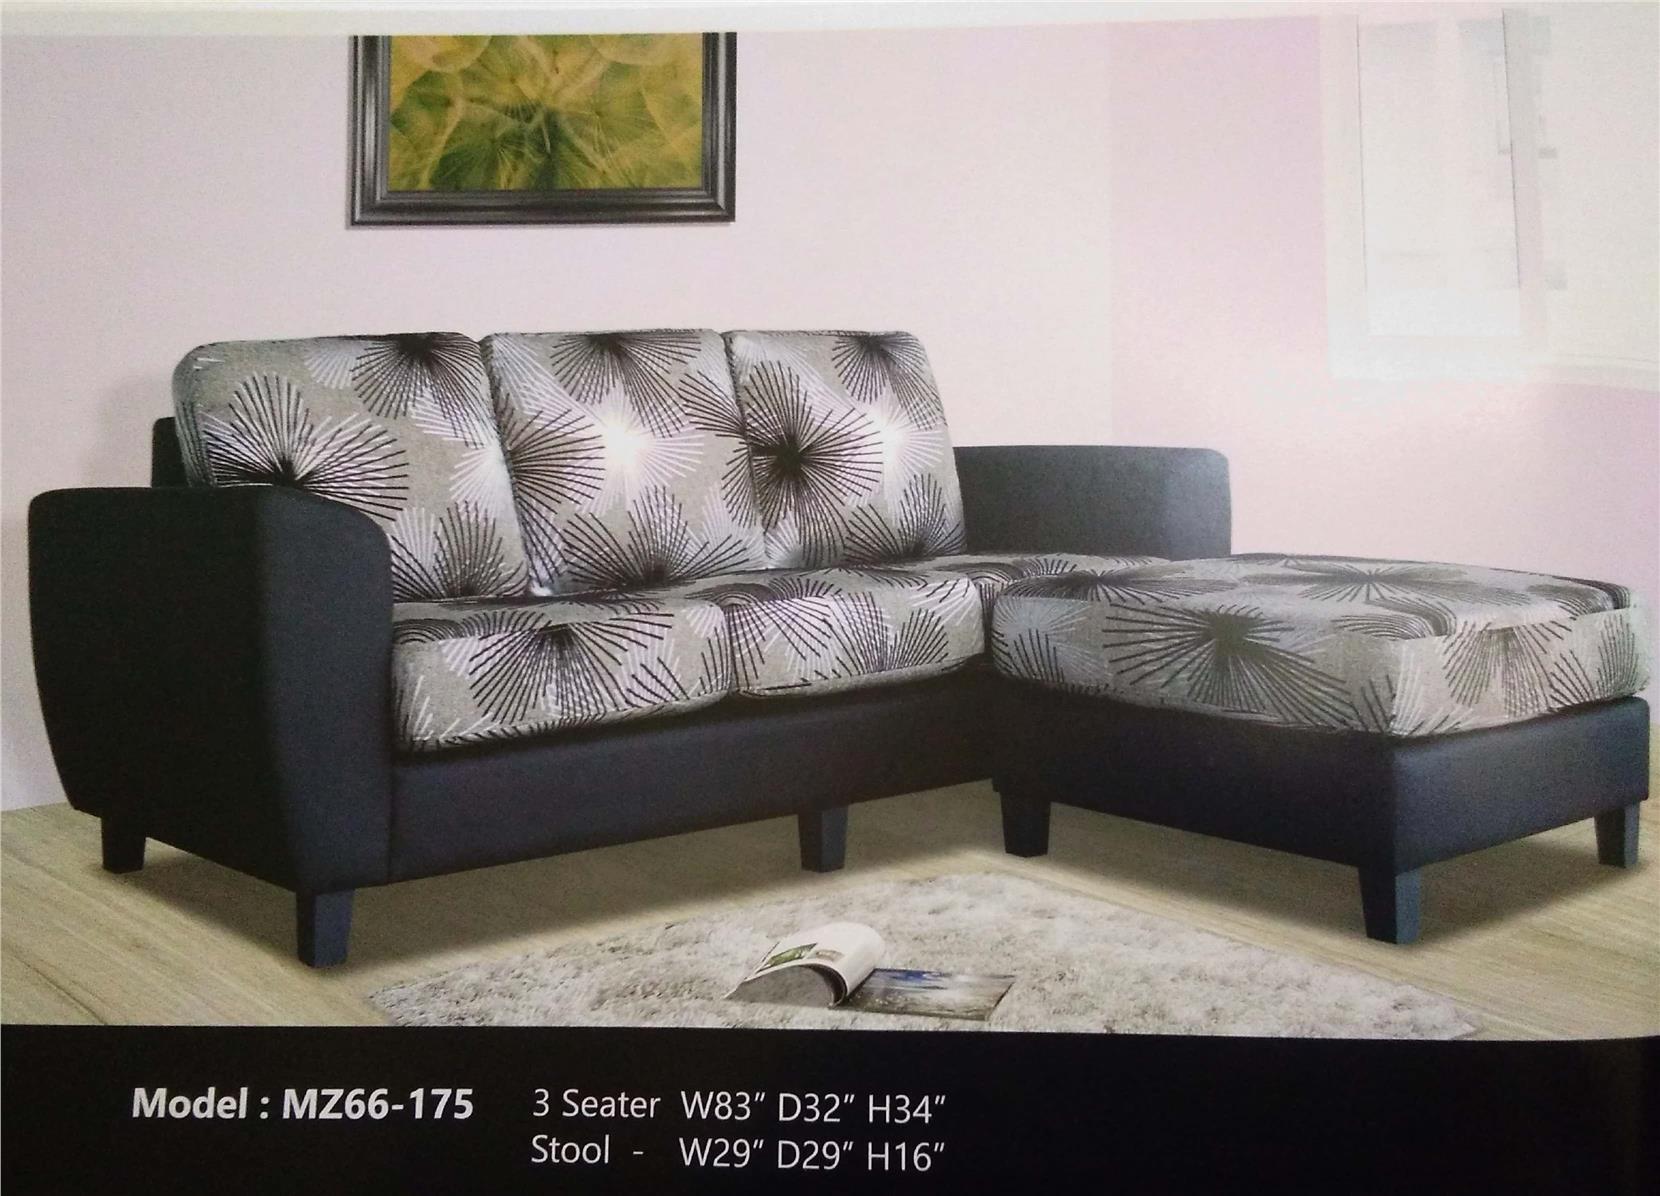 Sofa Recliner Murah Malaysia Best 5 Recliner Brands In Malaysia